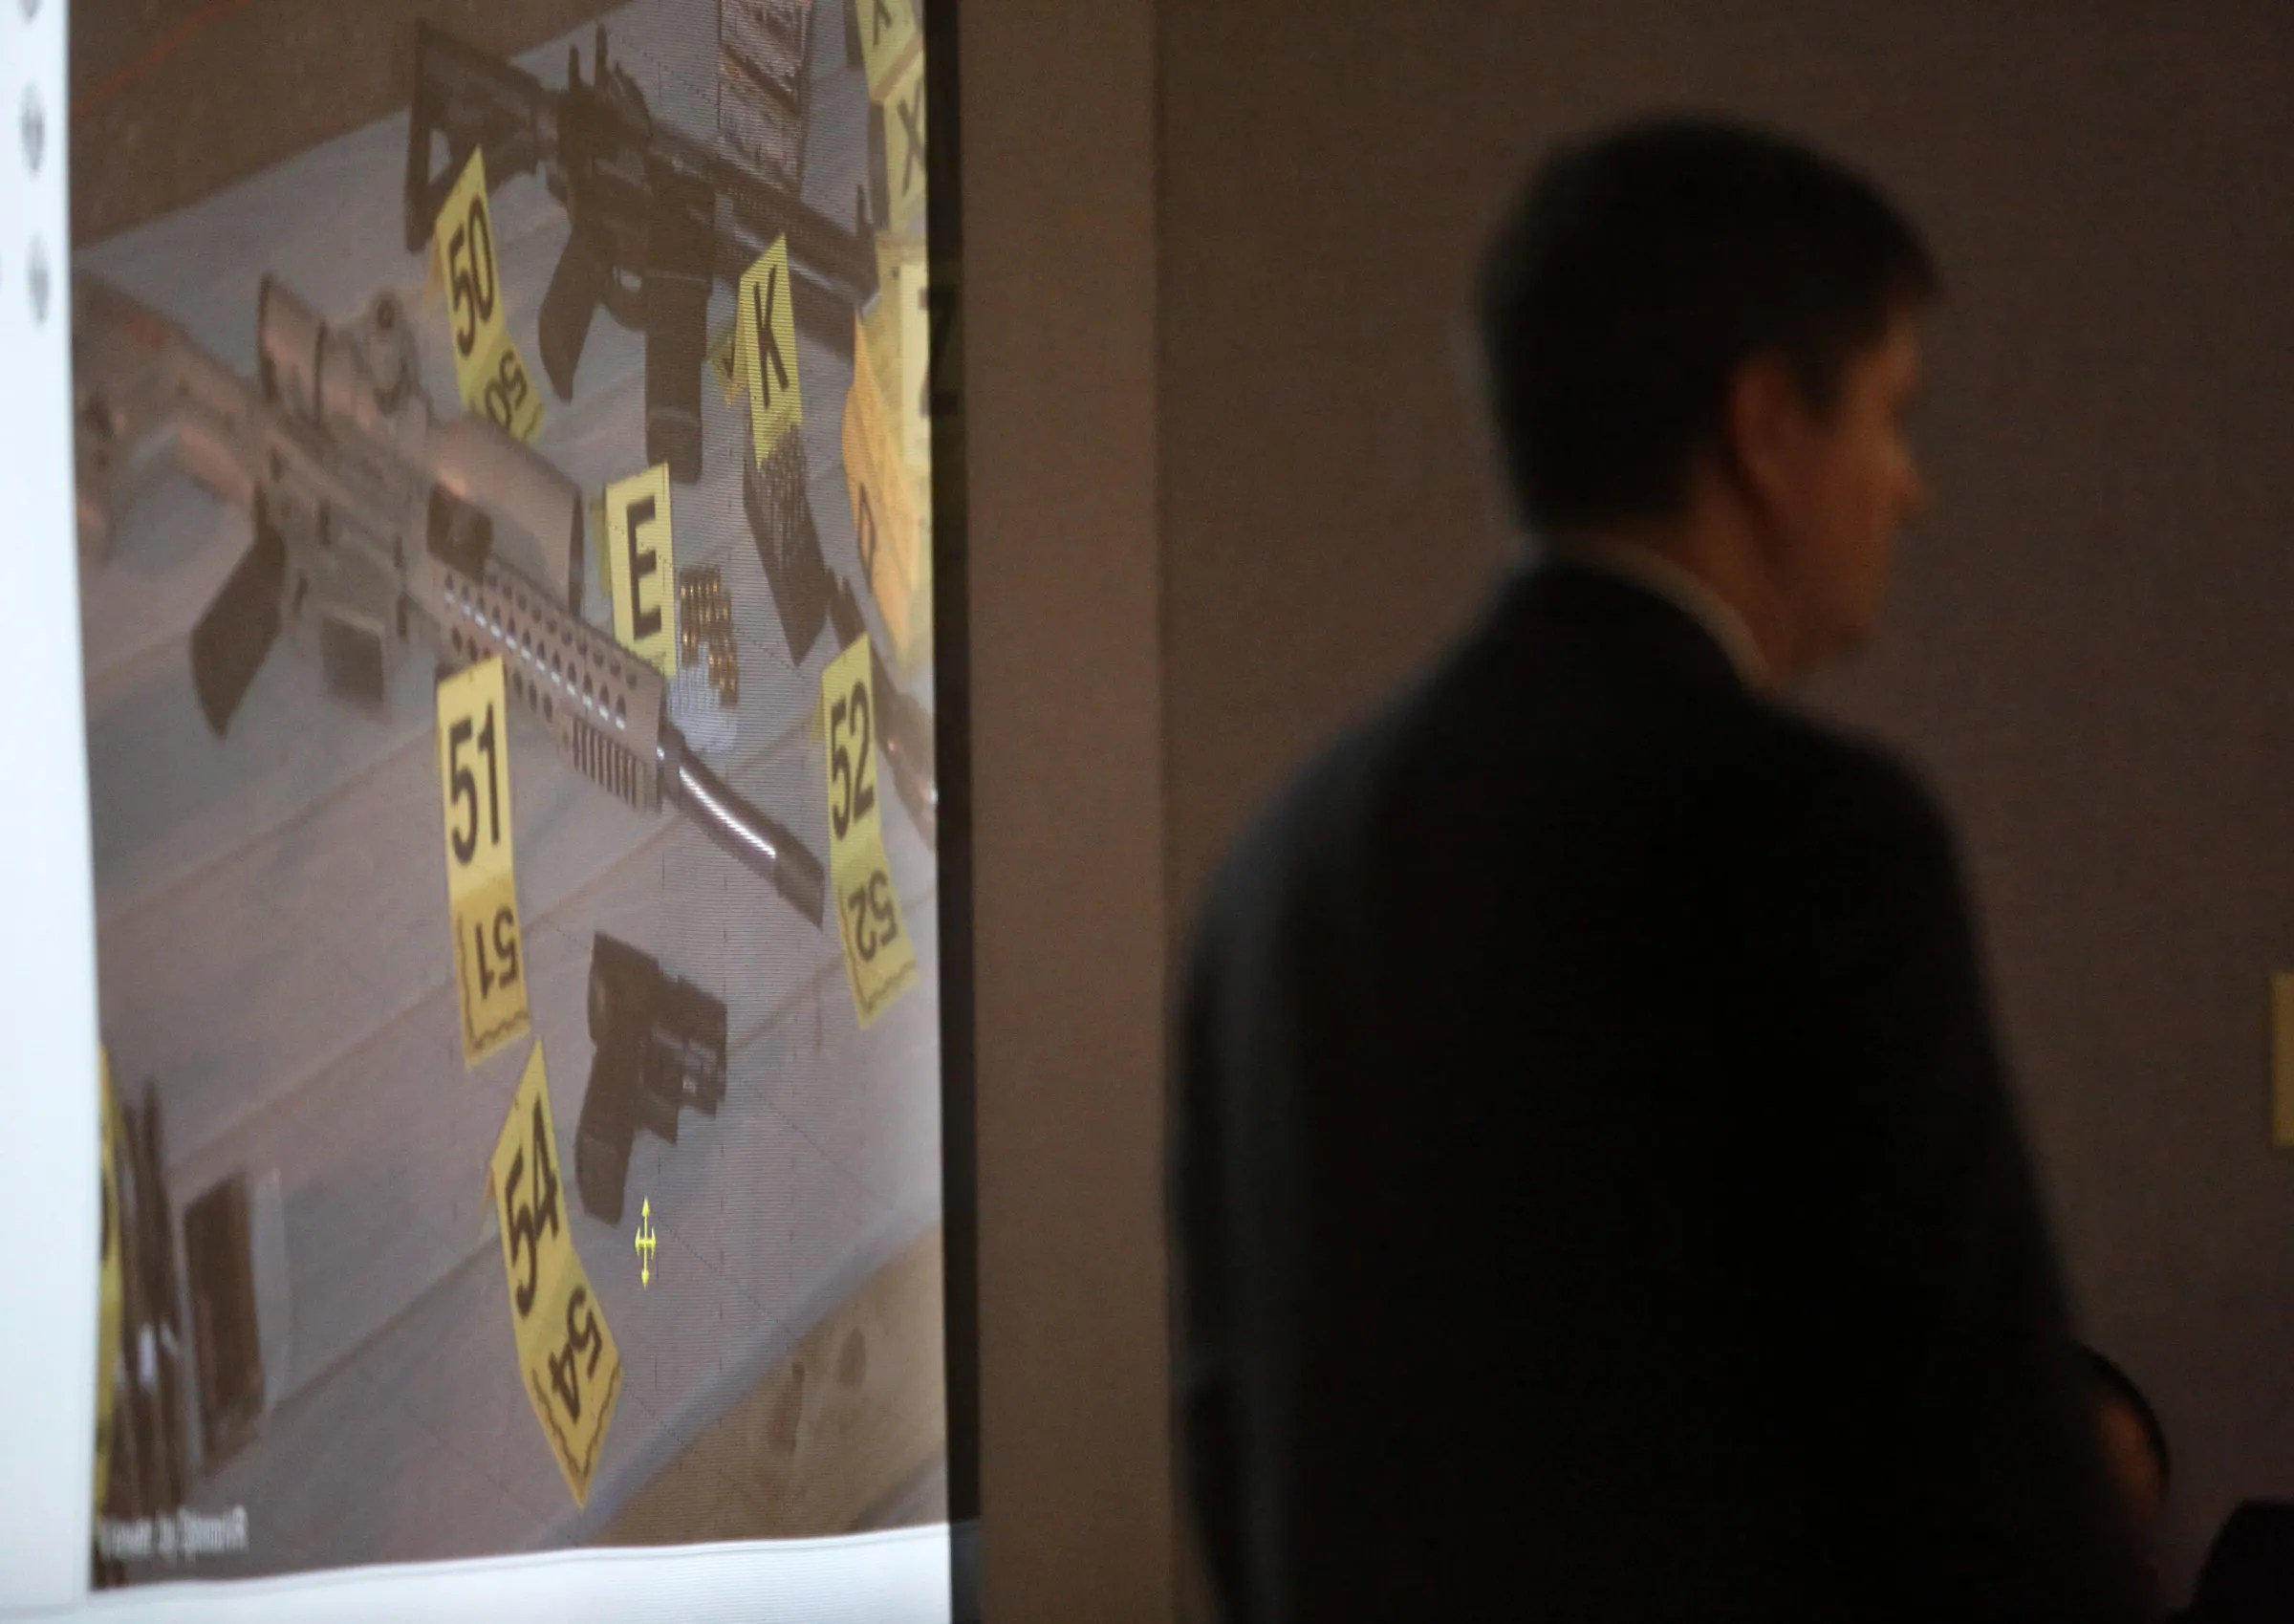 3 way displays minn kota trolling motor parts diagram 'american sniper' killer found guilty | the seattle times